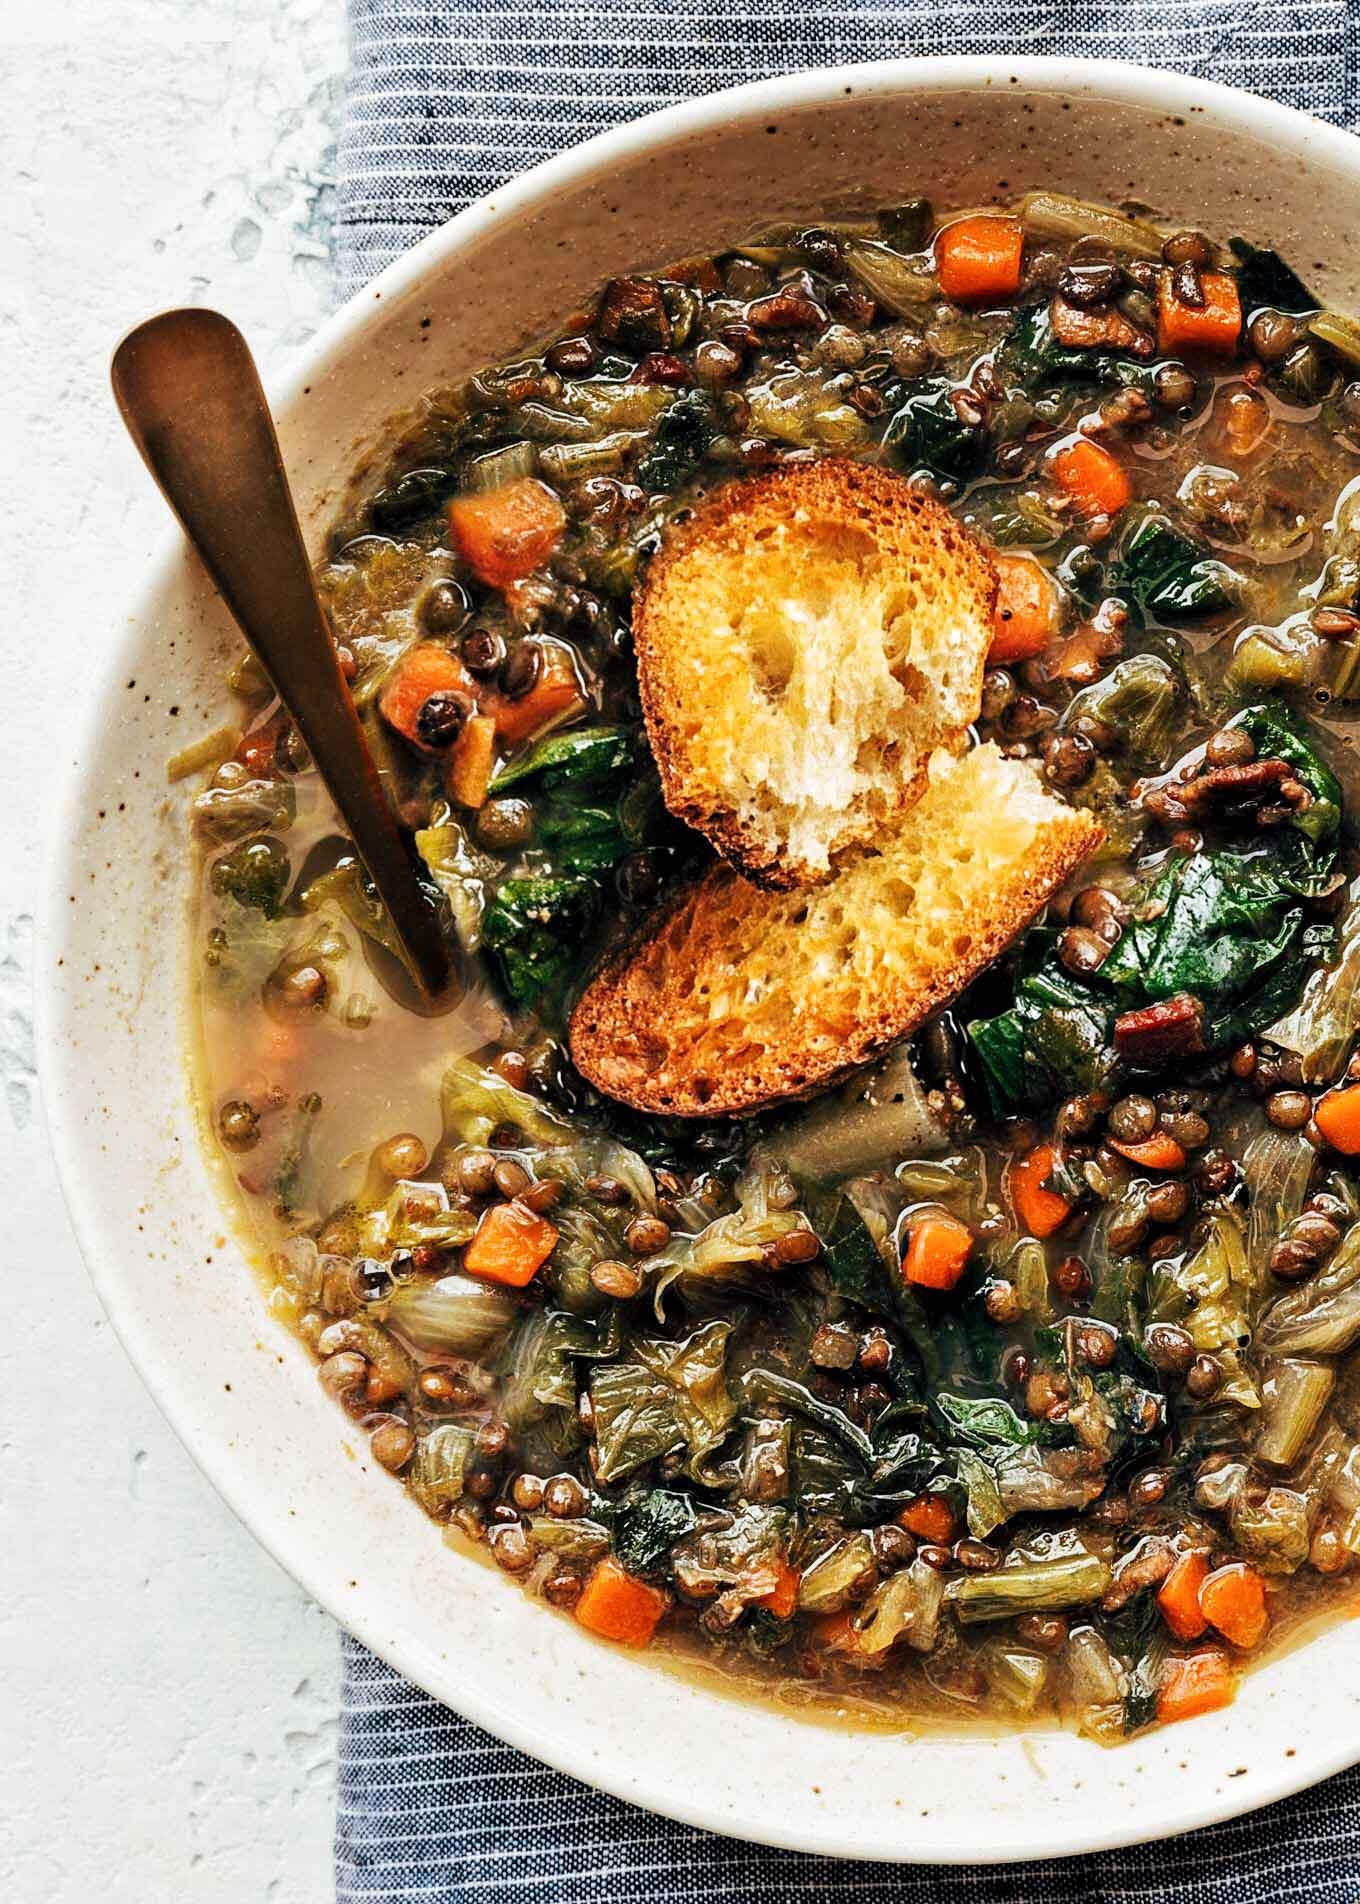 French Lentil Soup with Escarole